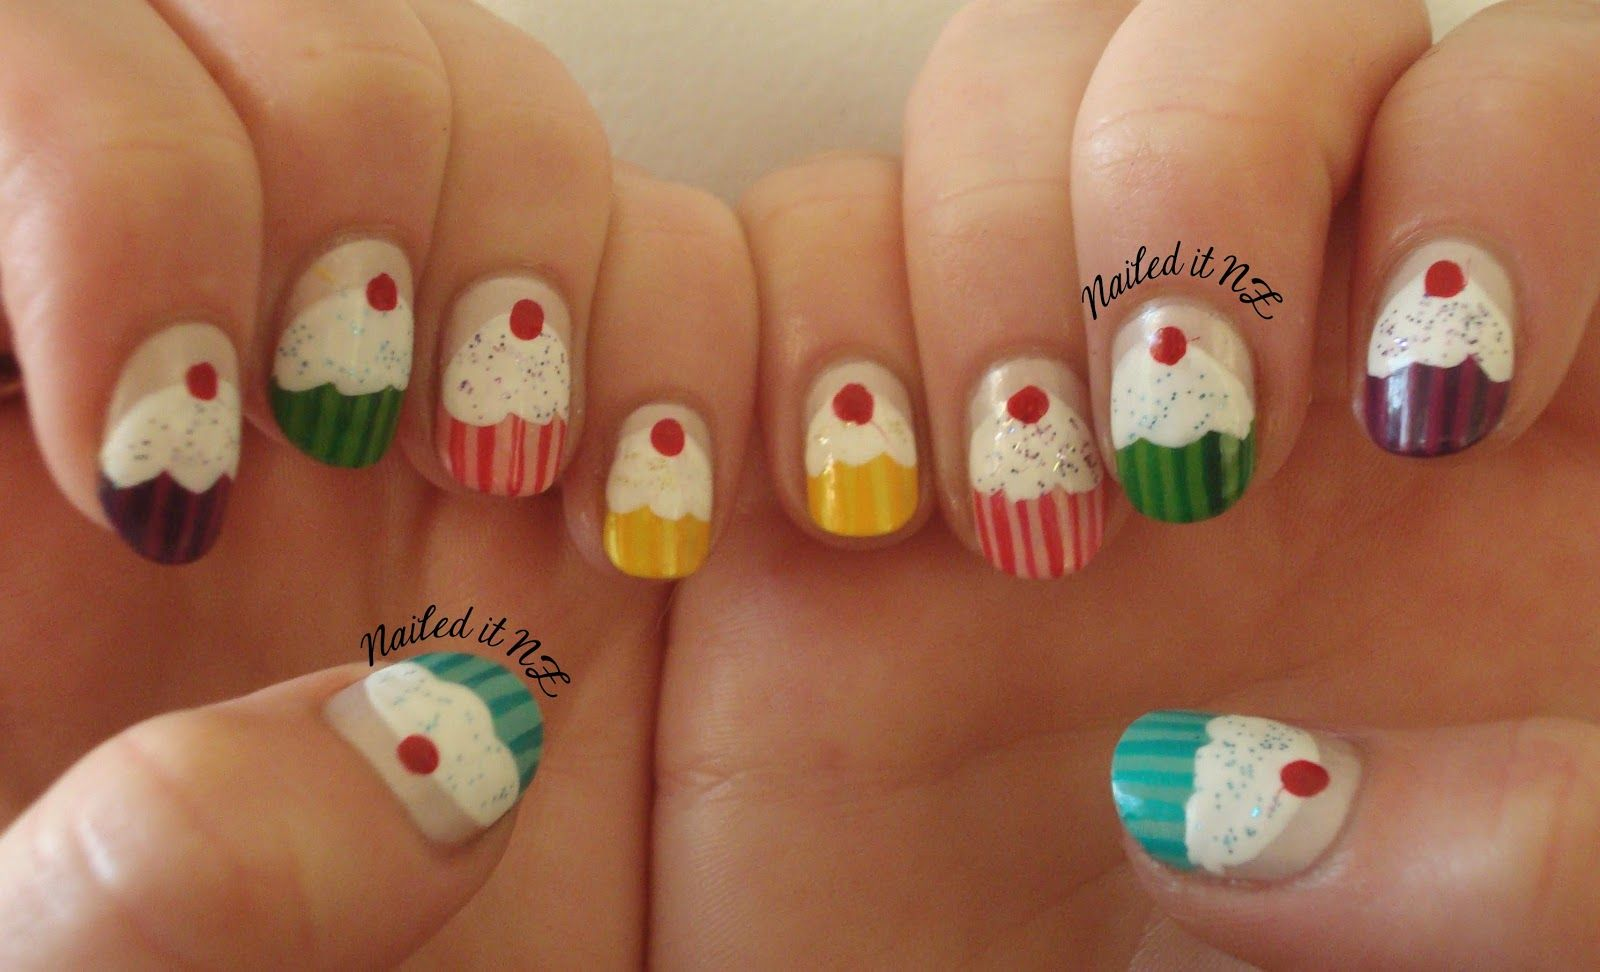 Kids nail art easy nail designs for short nails at home - Easy nail designs for short nails at home ...